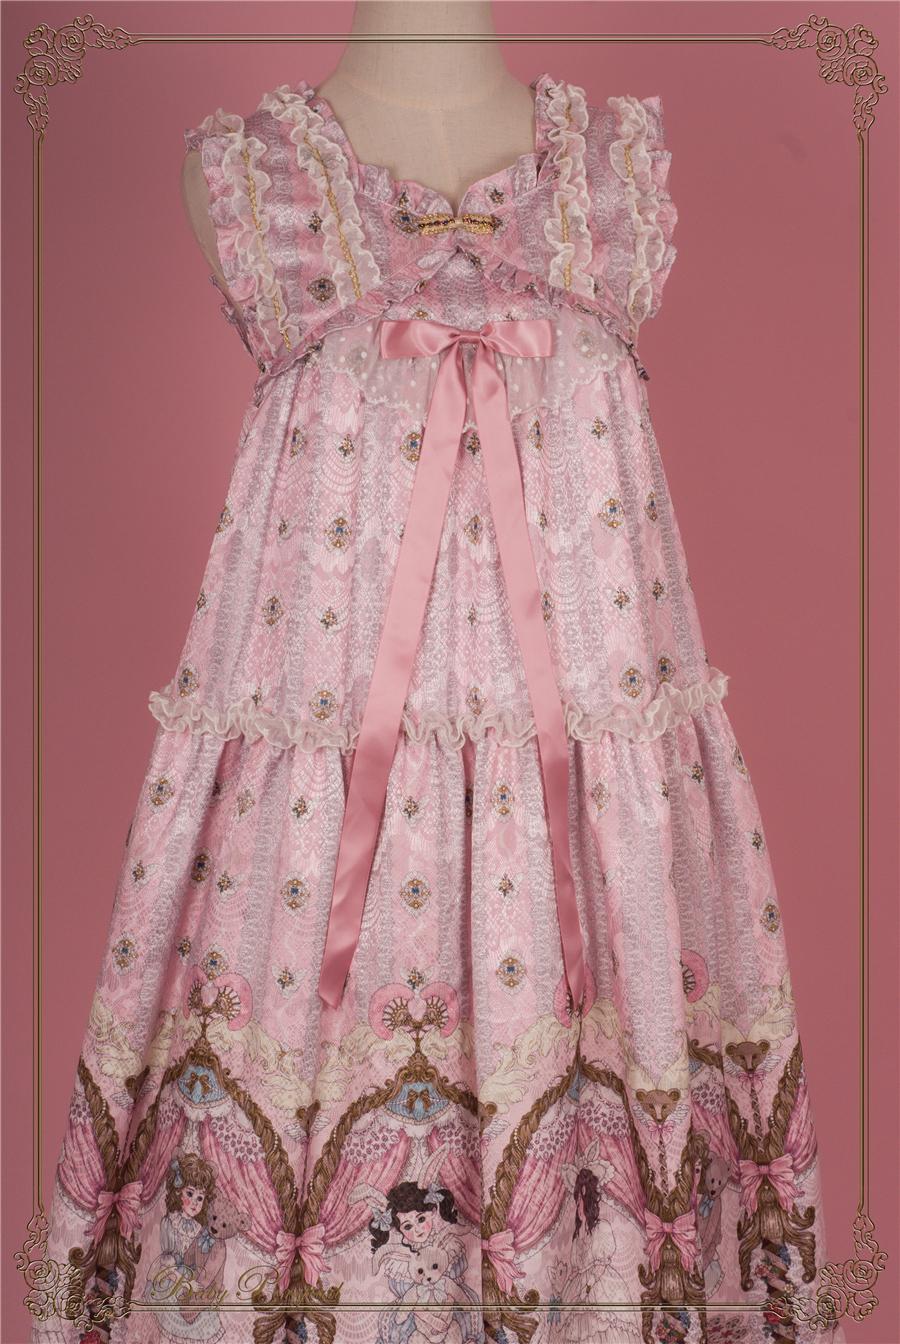 BabyPonytail_Stock Photo_My Favorite Companion_JSK Baby Doll Pink_02.jpg